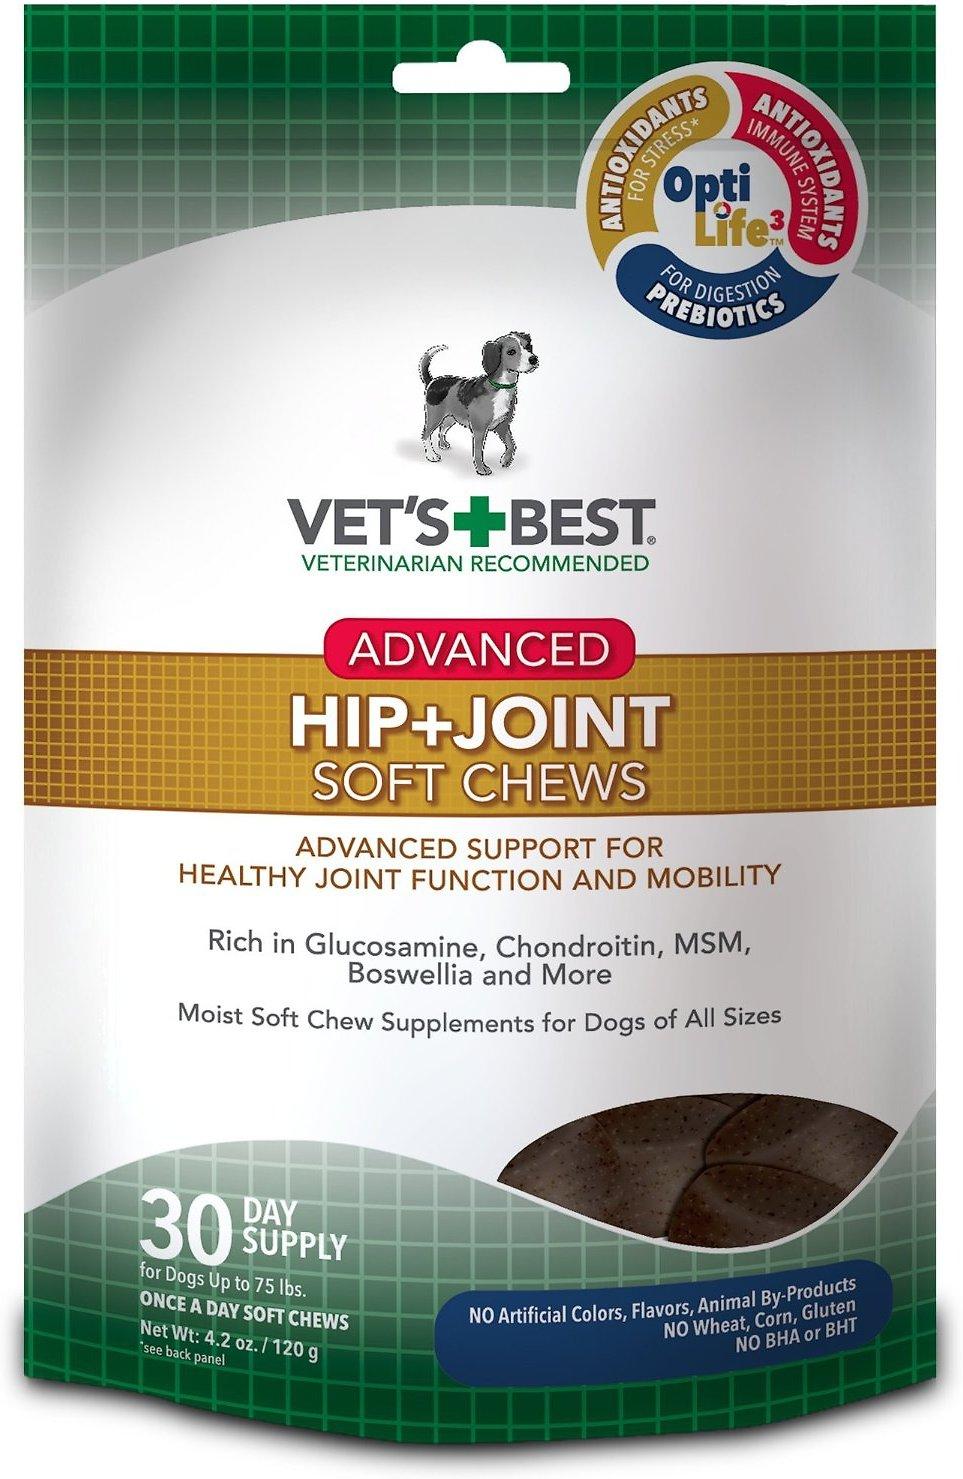 Vet's Best Advanced Hip + Joint Soft Chews Dog Supplement, 30 count Image